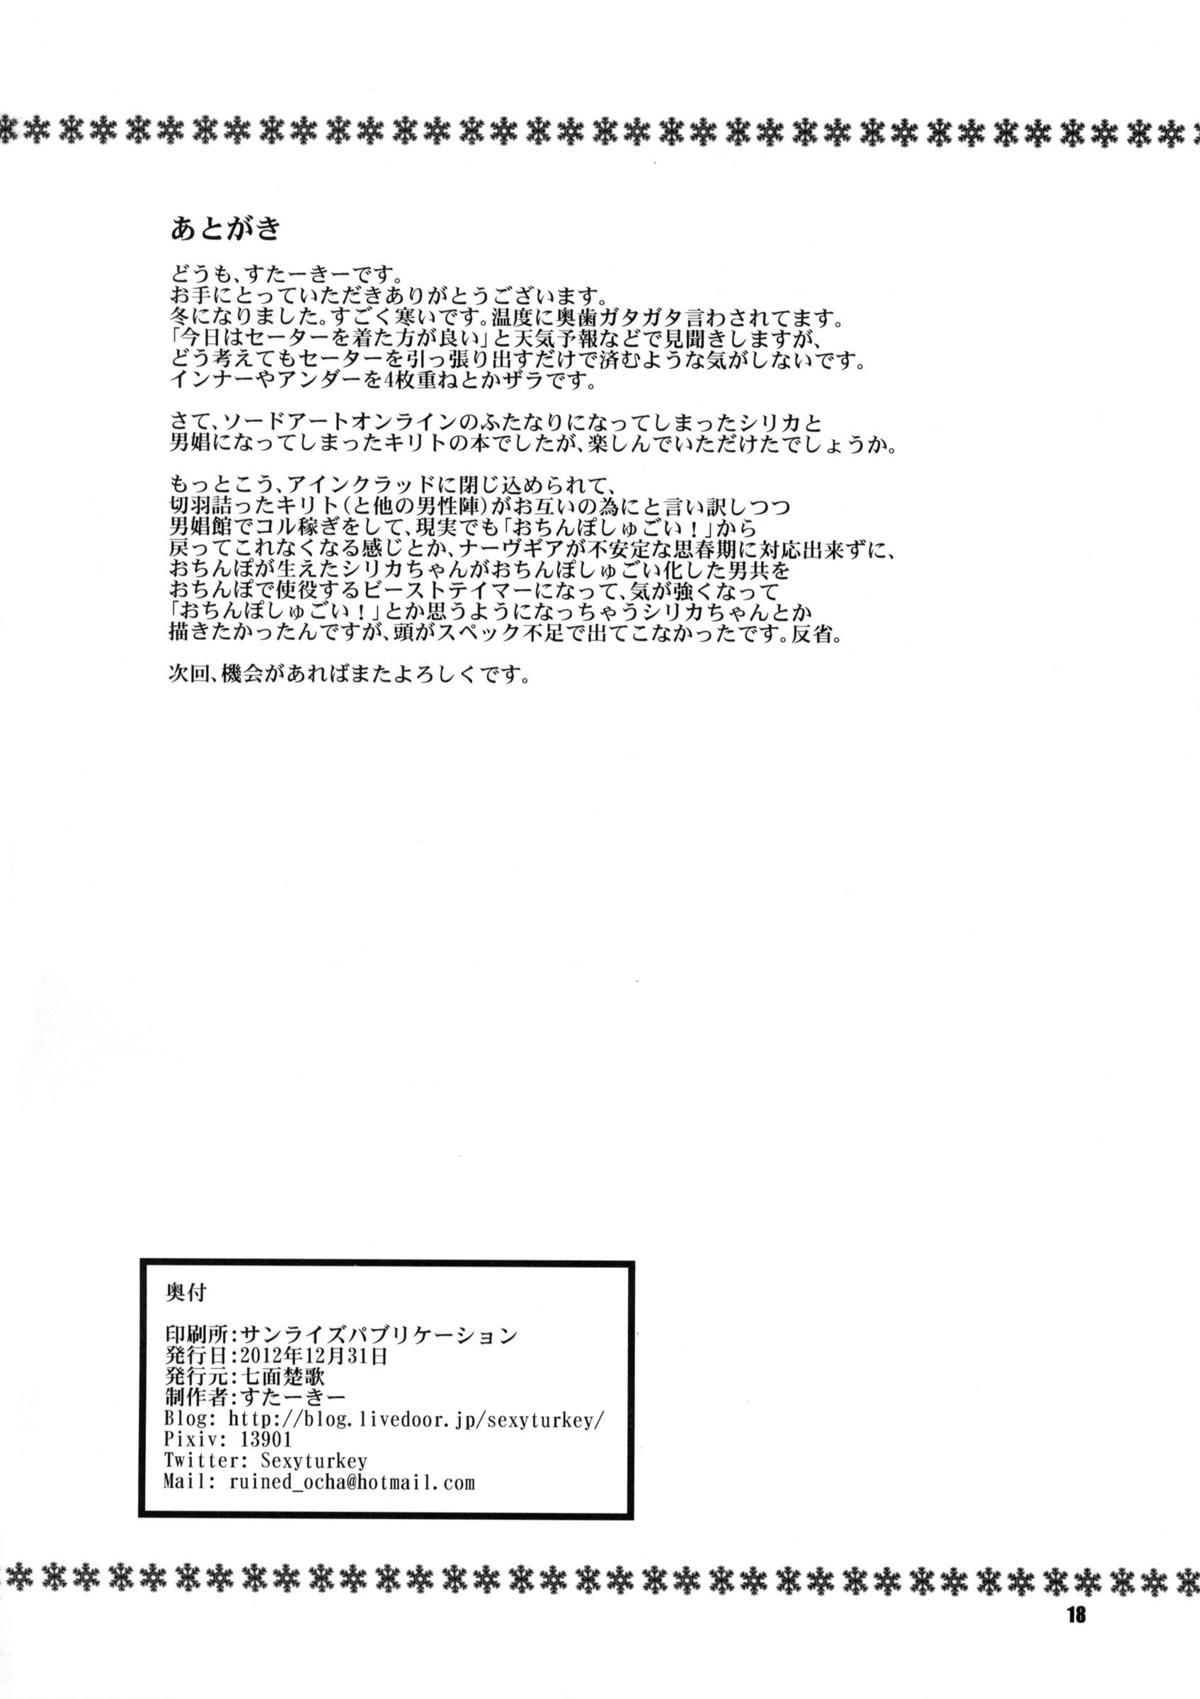 (C83) [Shichimen Soka (Sexyturkey)] Silica-chan ni Oshiri Ijirareru Hon | Silica-chan Playing With Your Butt Book (Sword Art Online) [English] 16